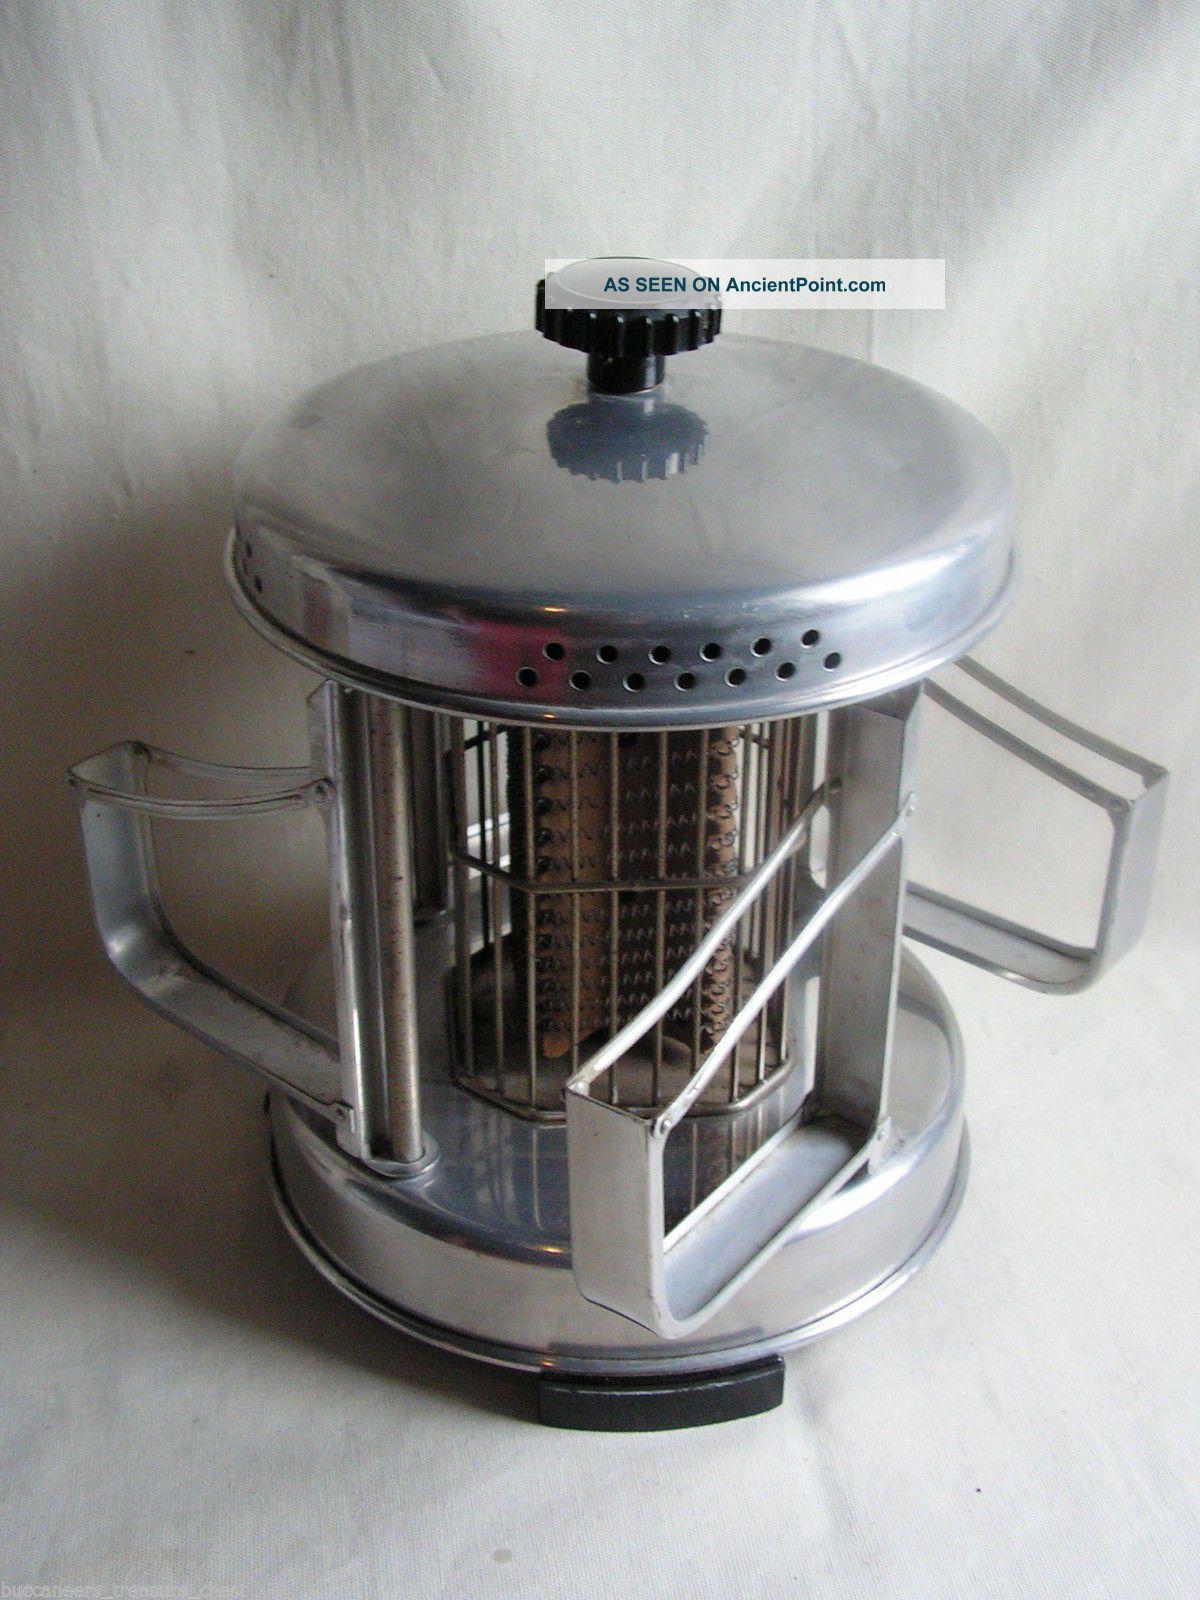 1930 Art Deco Aluminum Carousel Toaster Bakelite Machine Age Industrial Design Toasters photo